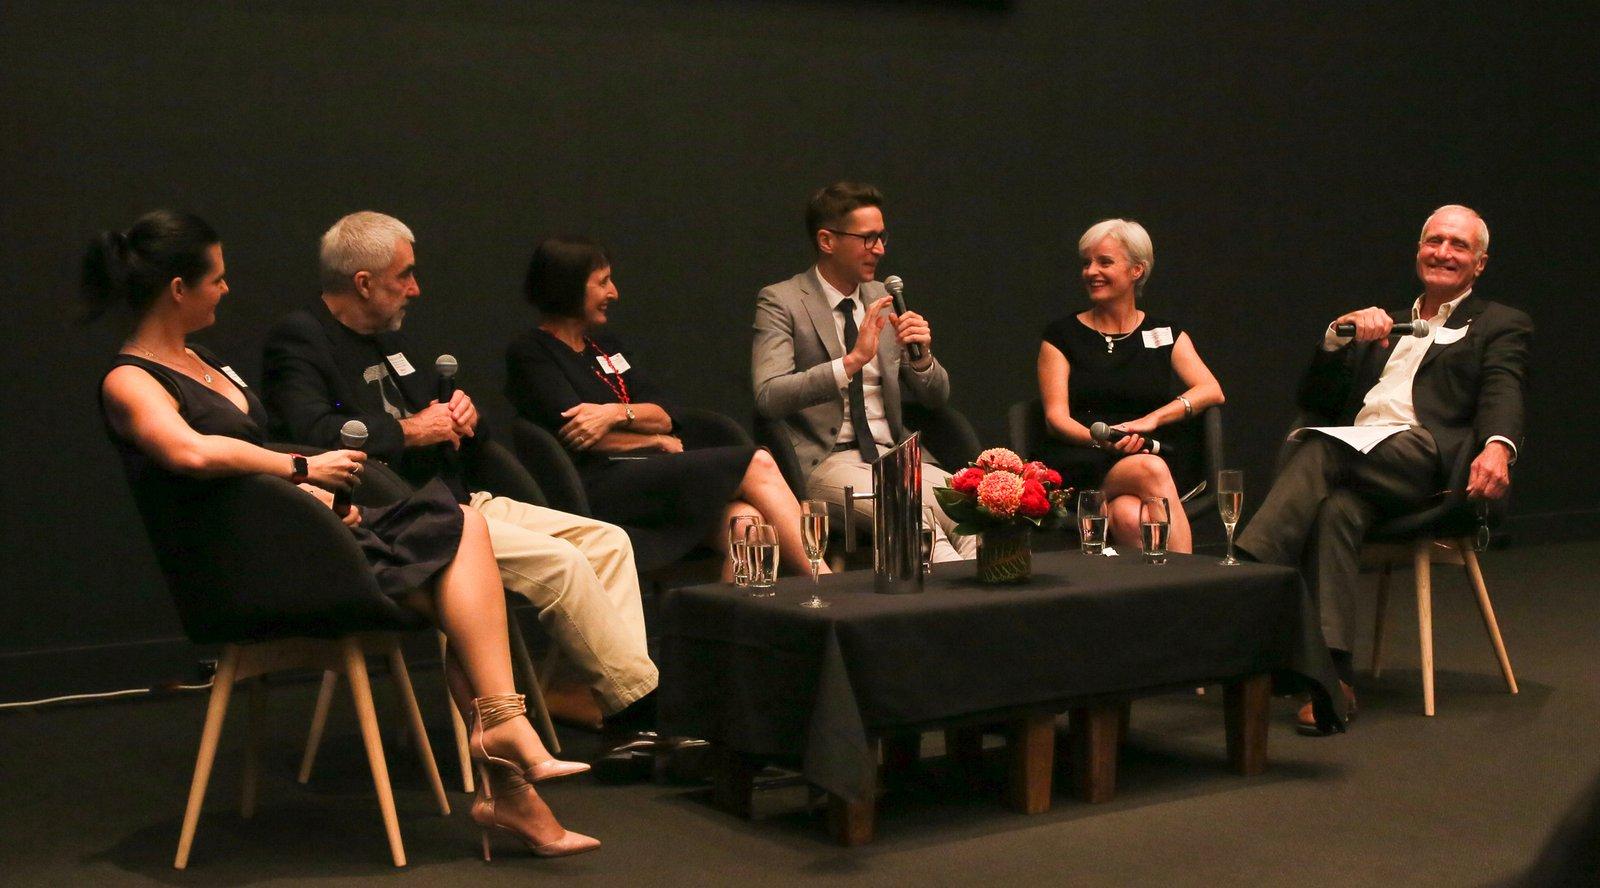 Eureka Prizes Ambassadors Event 2016